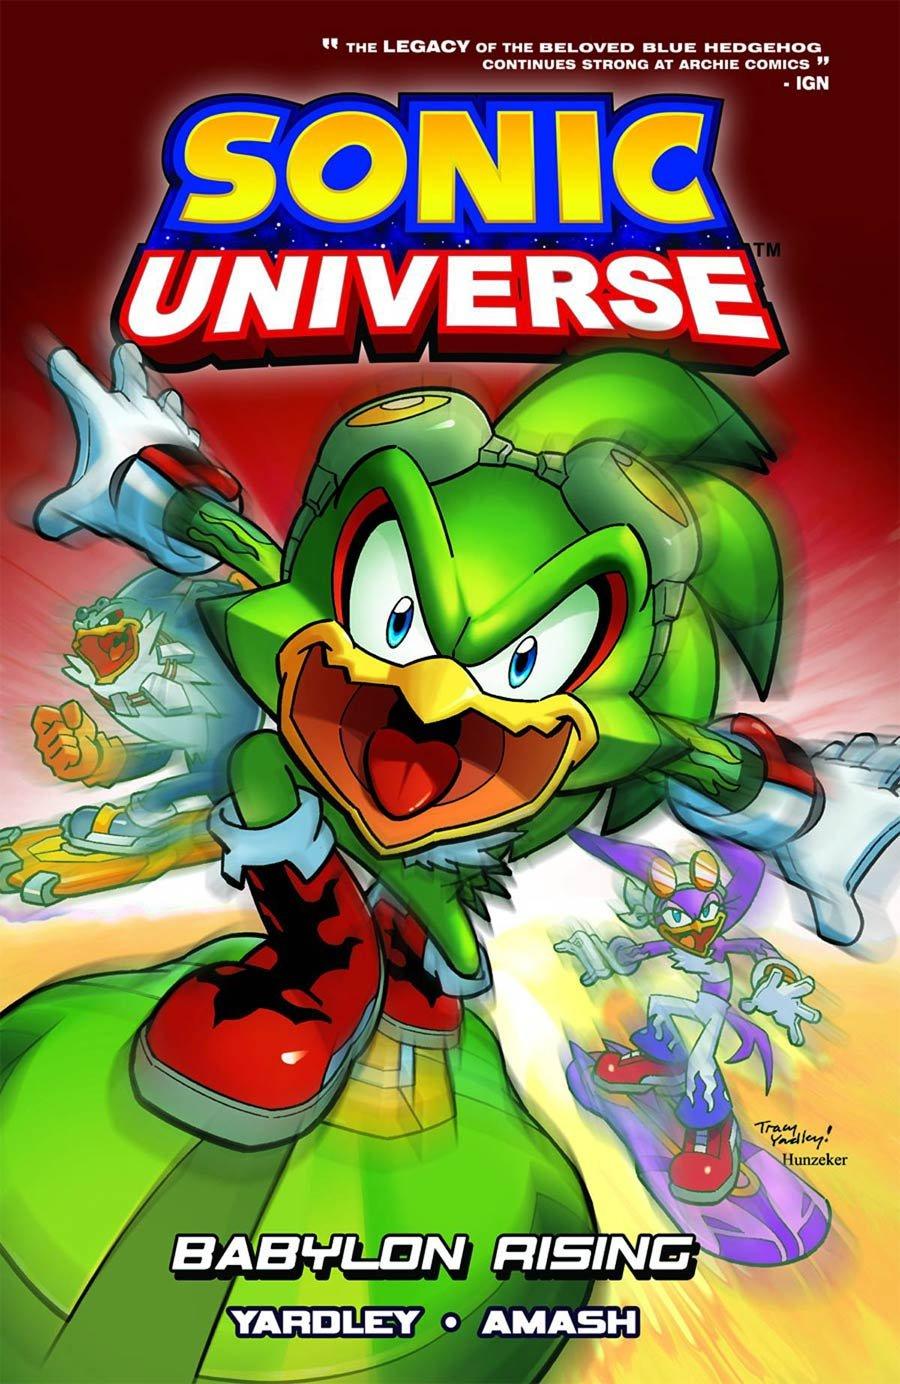 Sonic Universe Vol.09 - Babylon Rising (canceled)